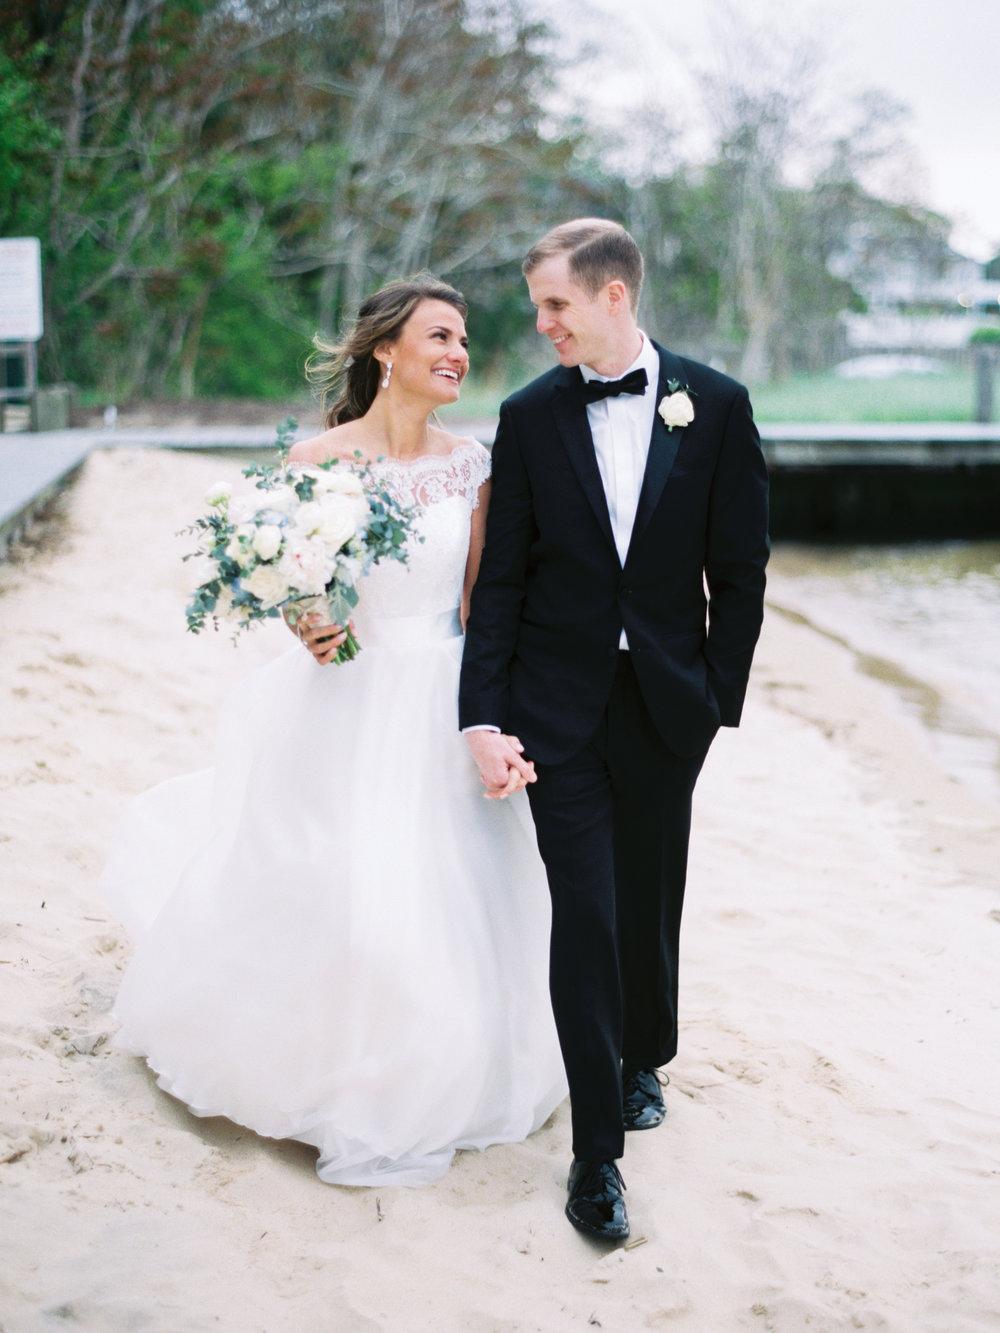 brianne&david_5.12.18_wedding-481.jpg